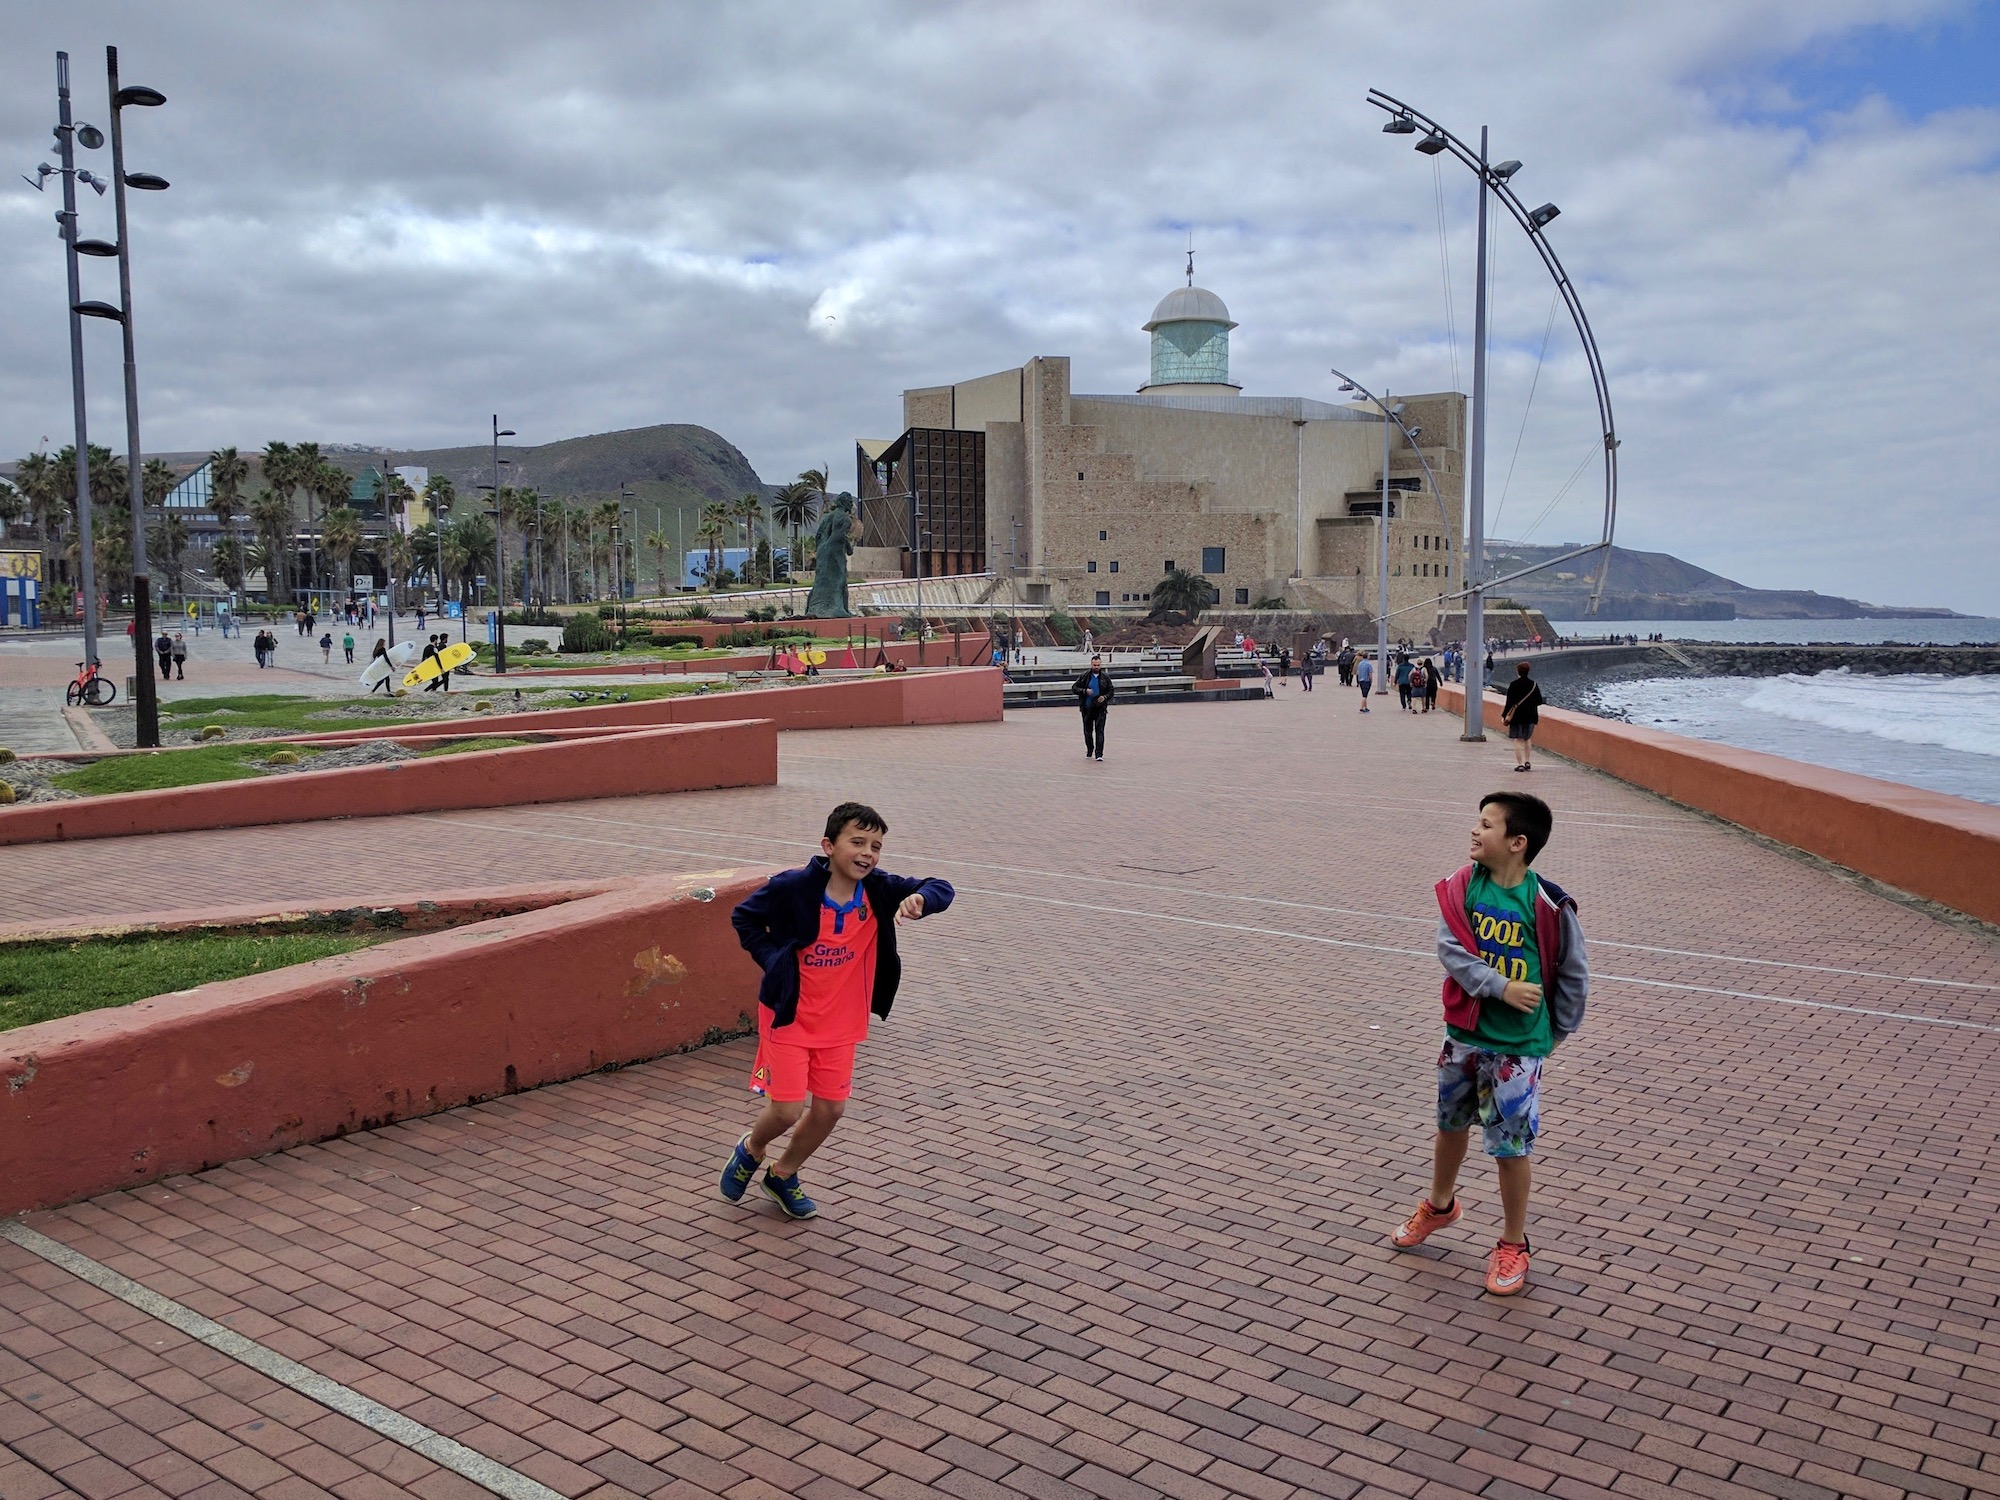 Strandpromenade von Las Palmas, GC